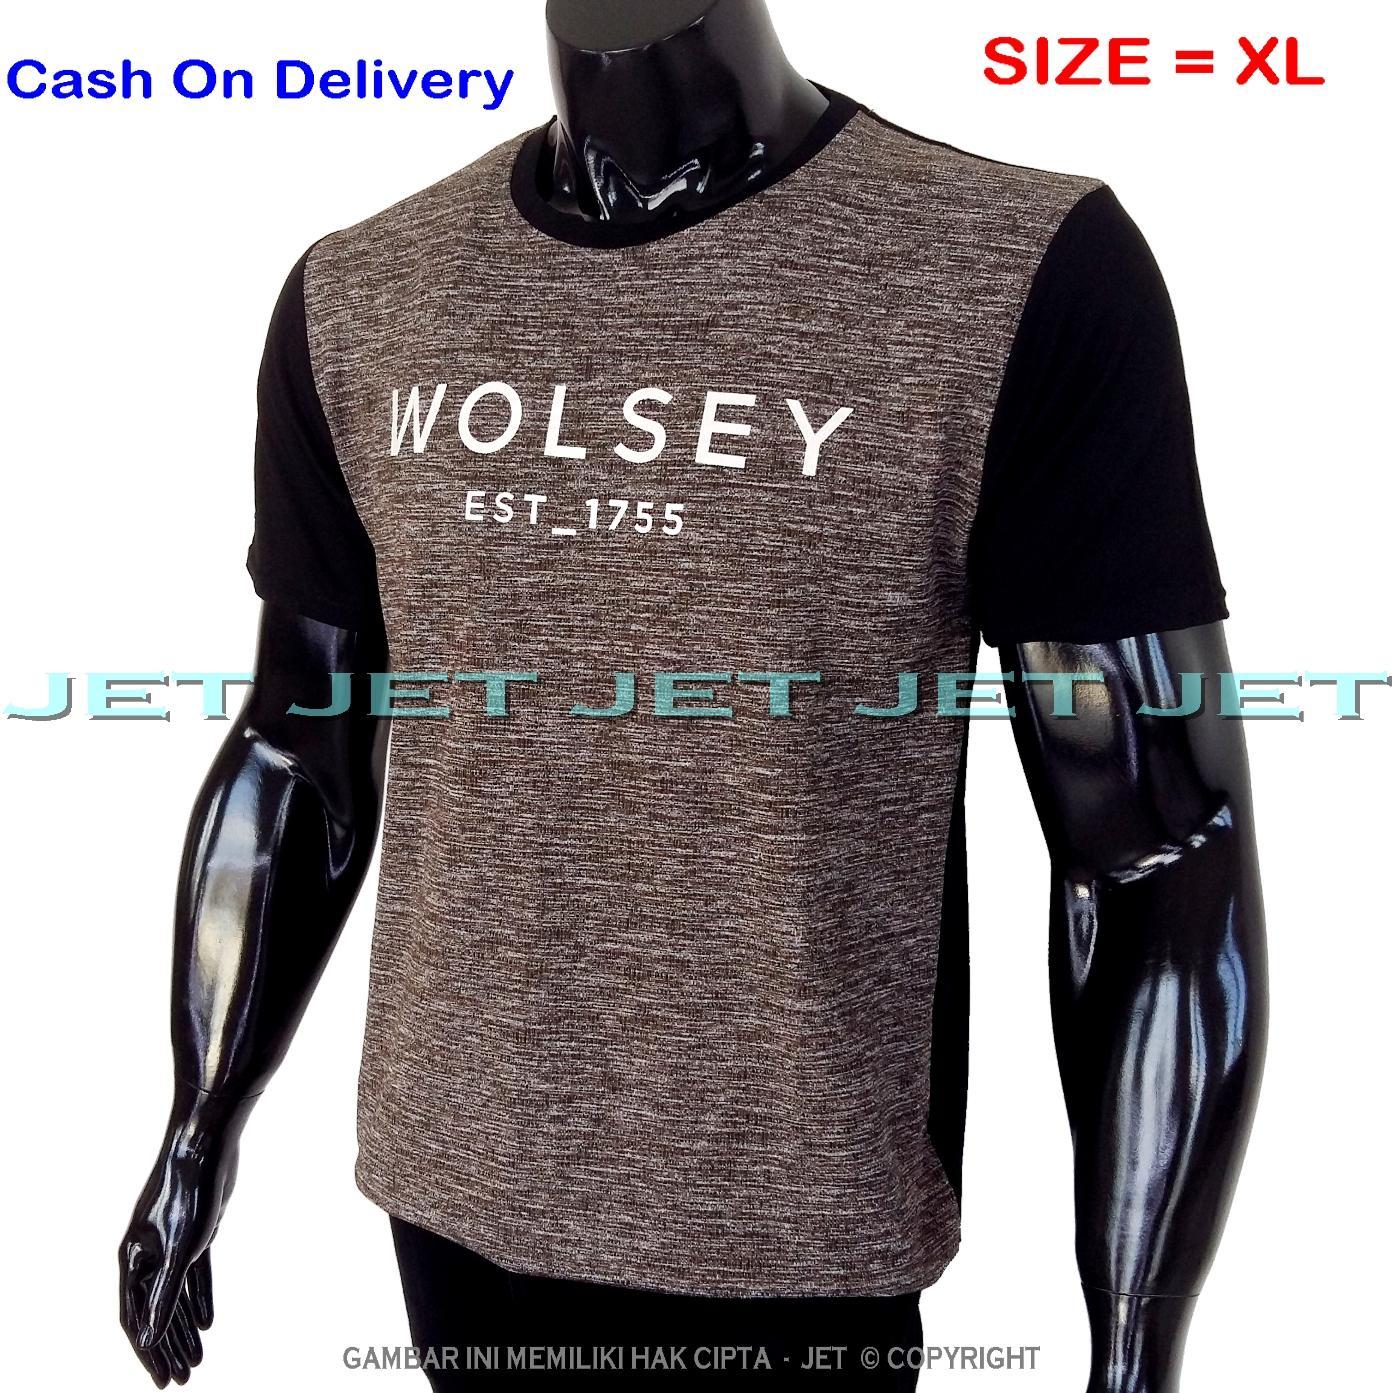 JeT - Kaos Distro WOLSEY Size XL Dewasa Lengan Pendek Soft Rayon Viscose Lycra Tidak Pasaran Sablonan Eropa Gradasi